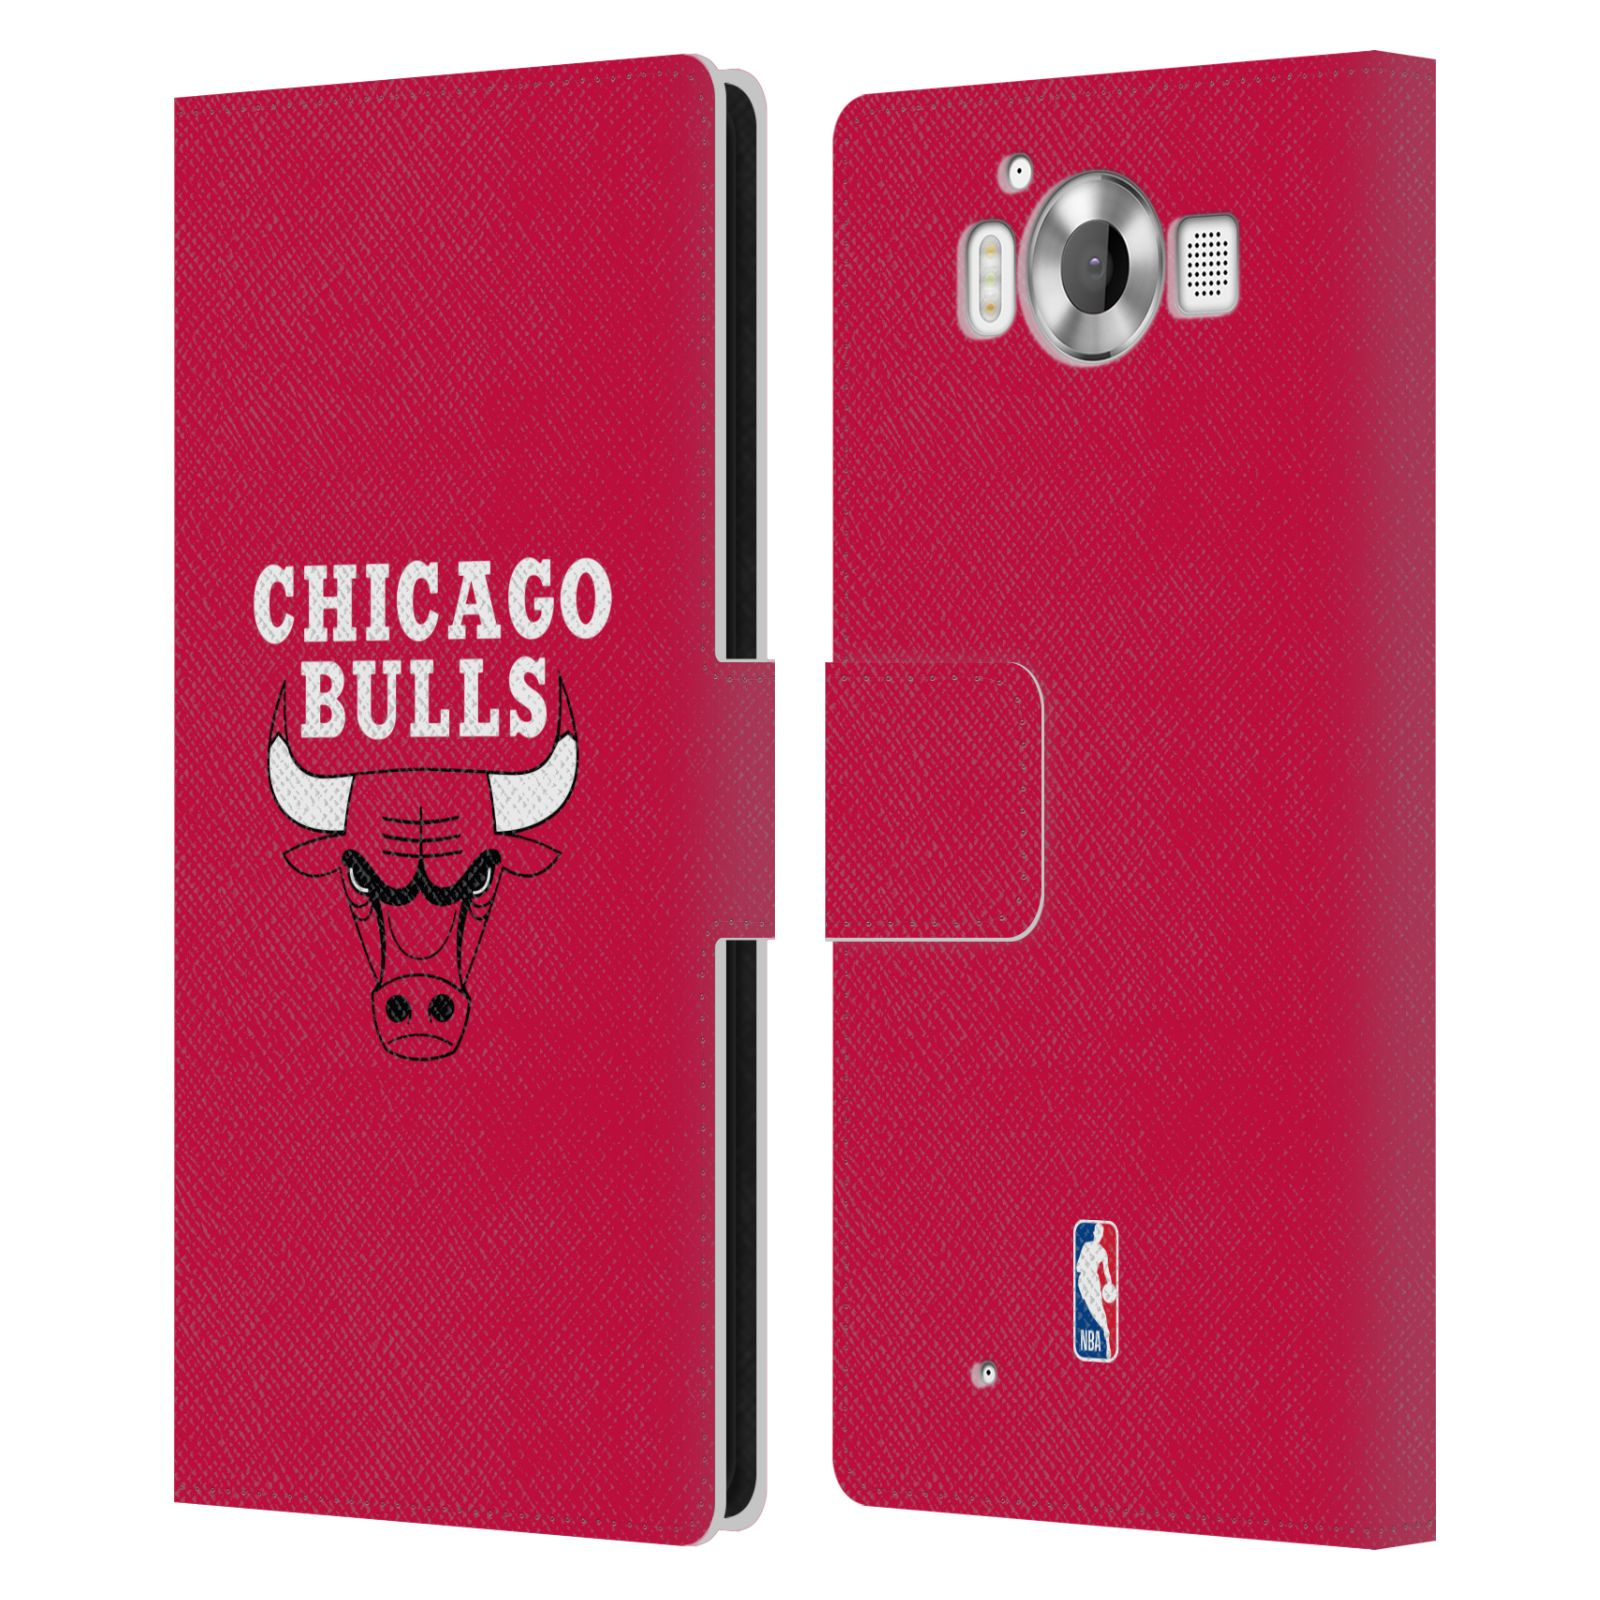 Pouzdro na mobil Nokia Lumia 950 - Head Case -NBA - Chicago Bulls červená barva znak